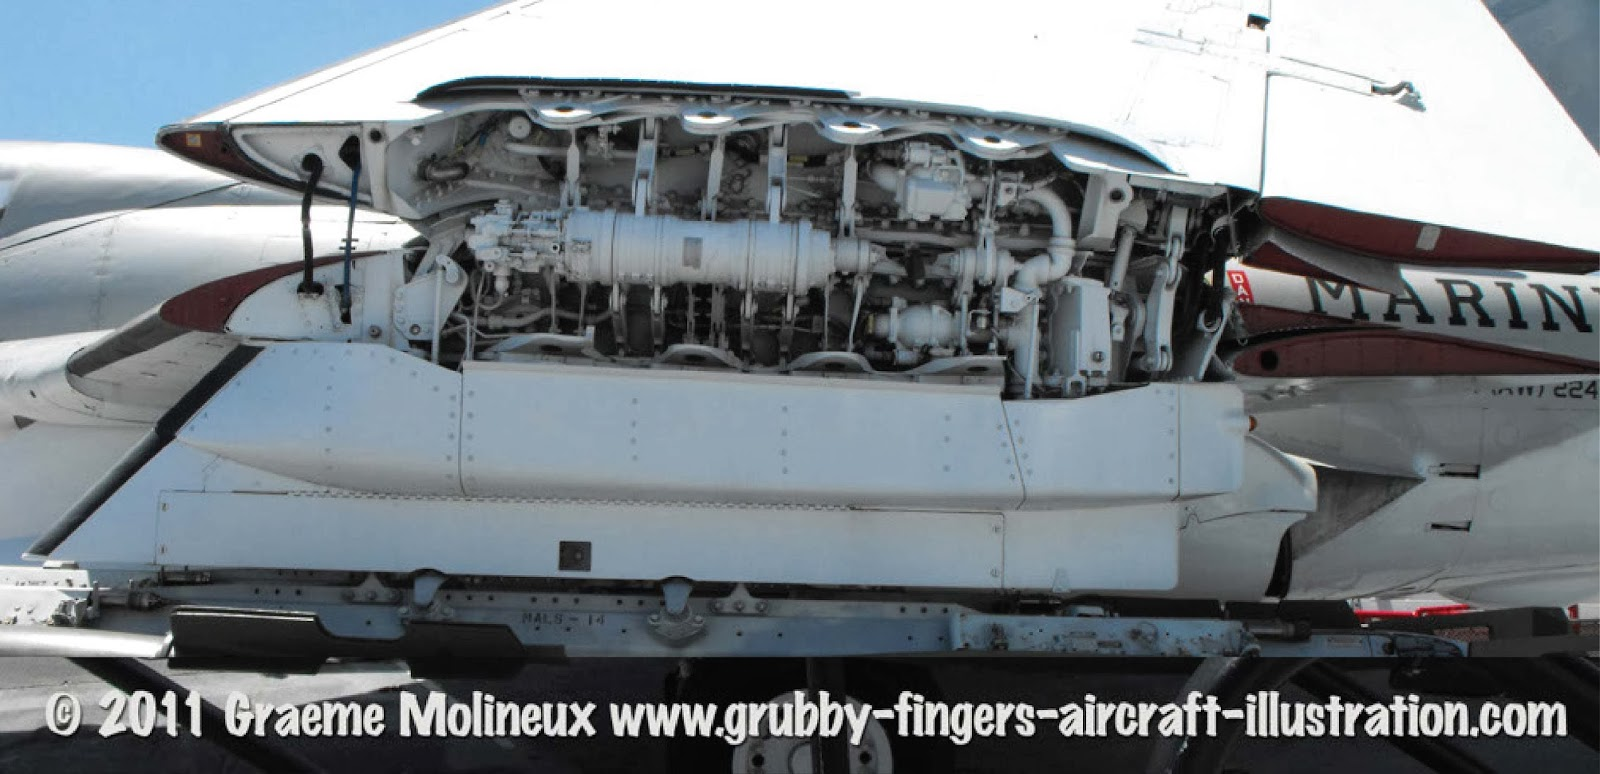 Tailhook Topics: Grumman A-6 Wing-Fold Differences